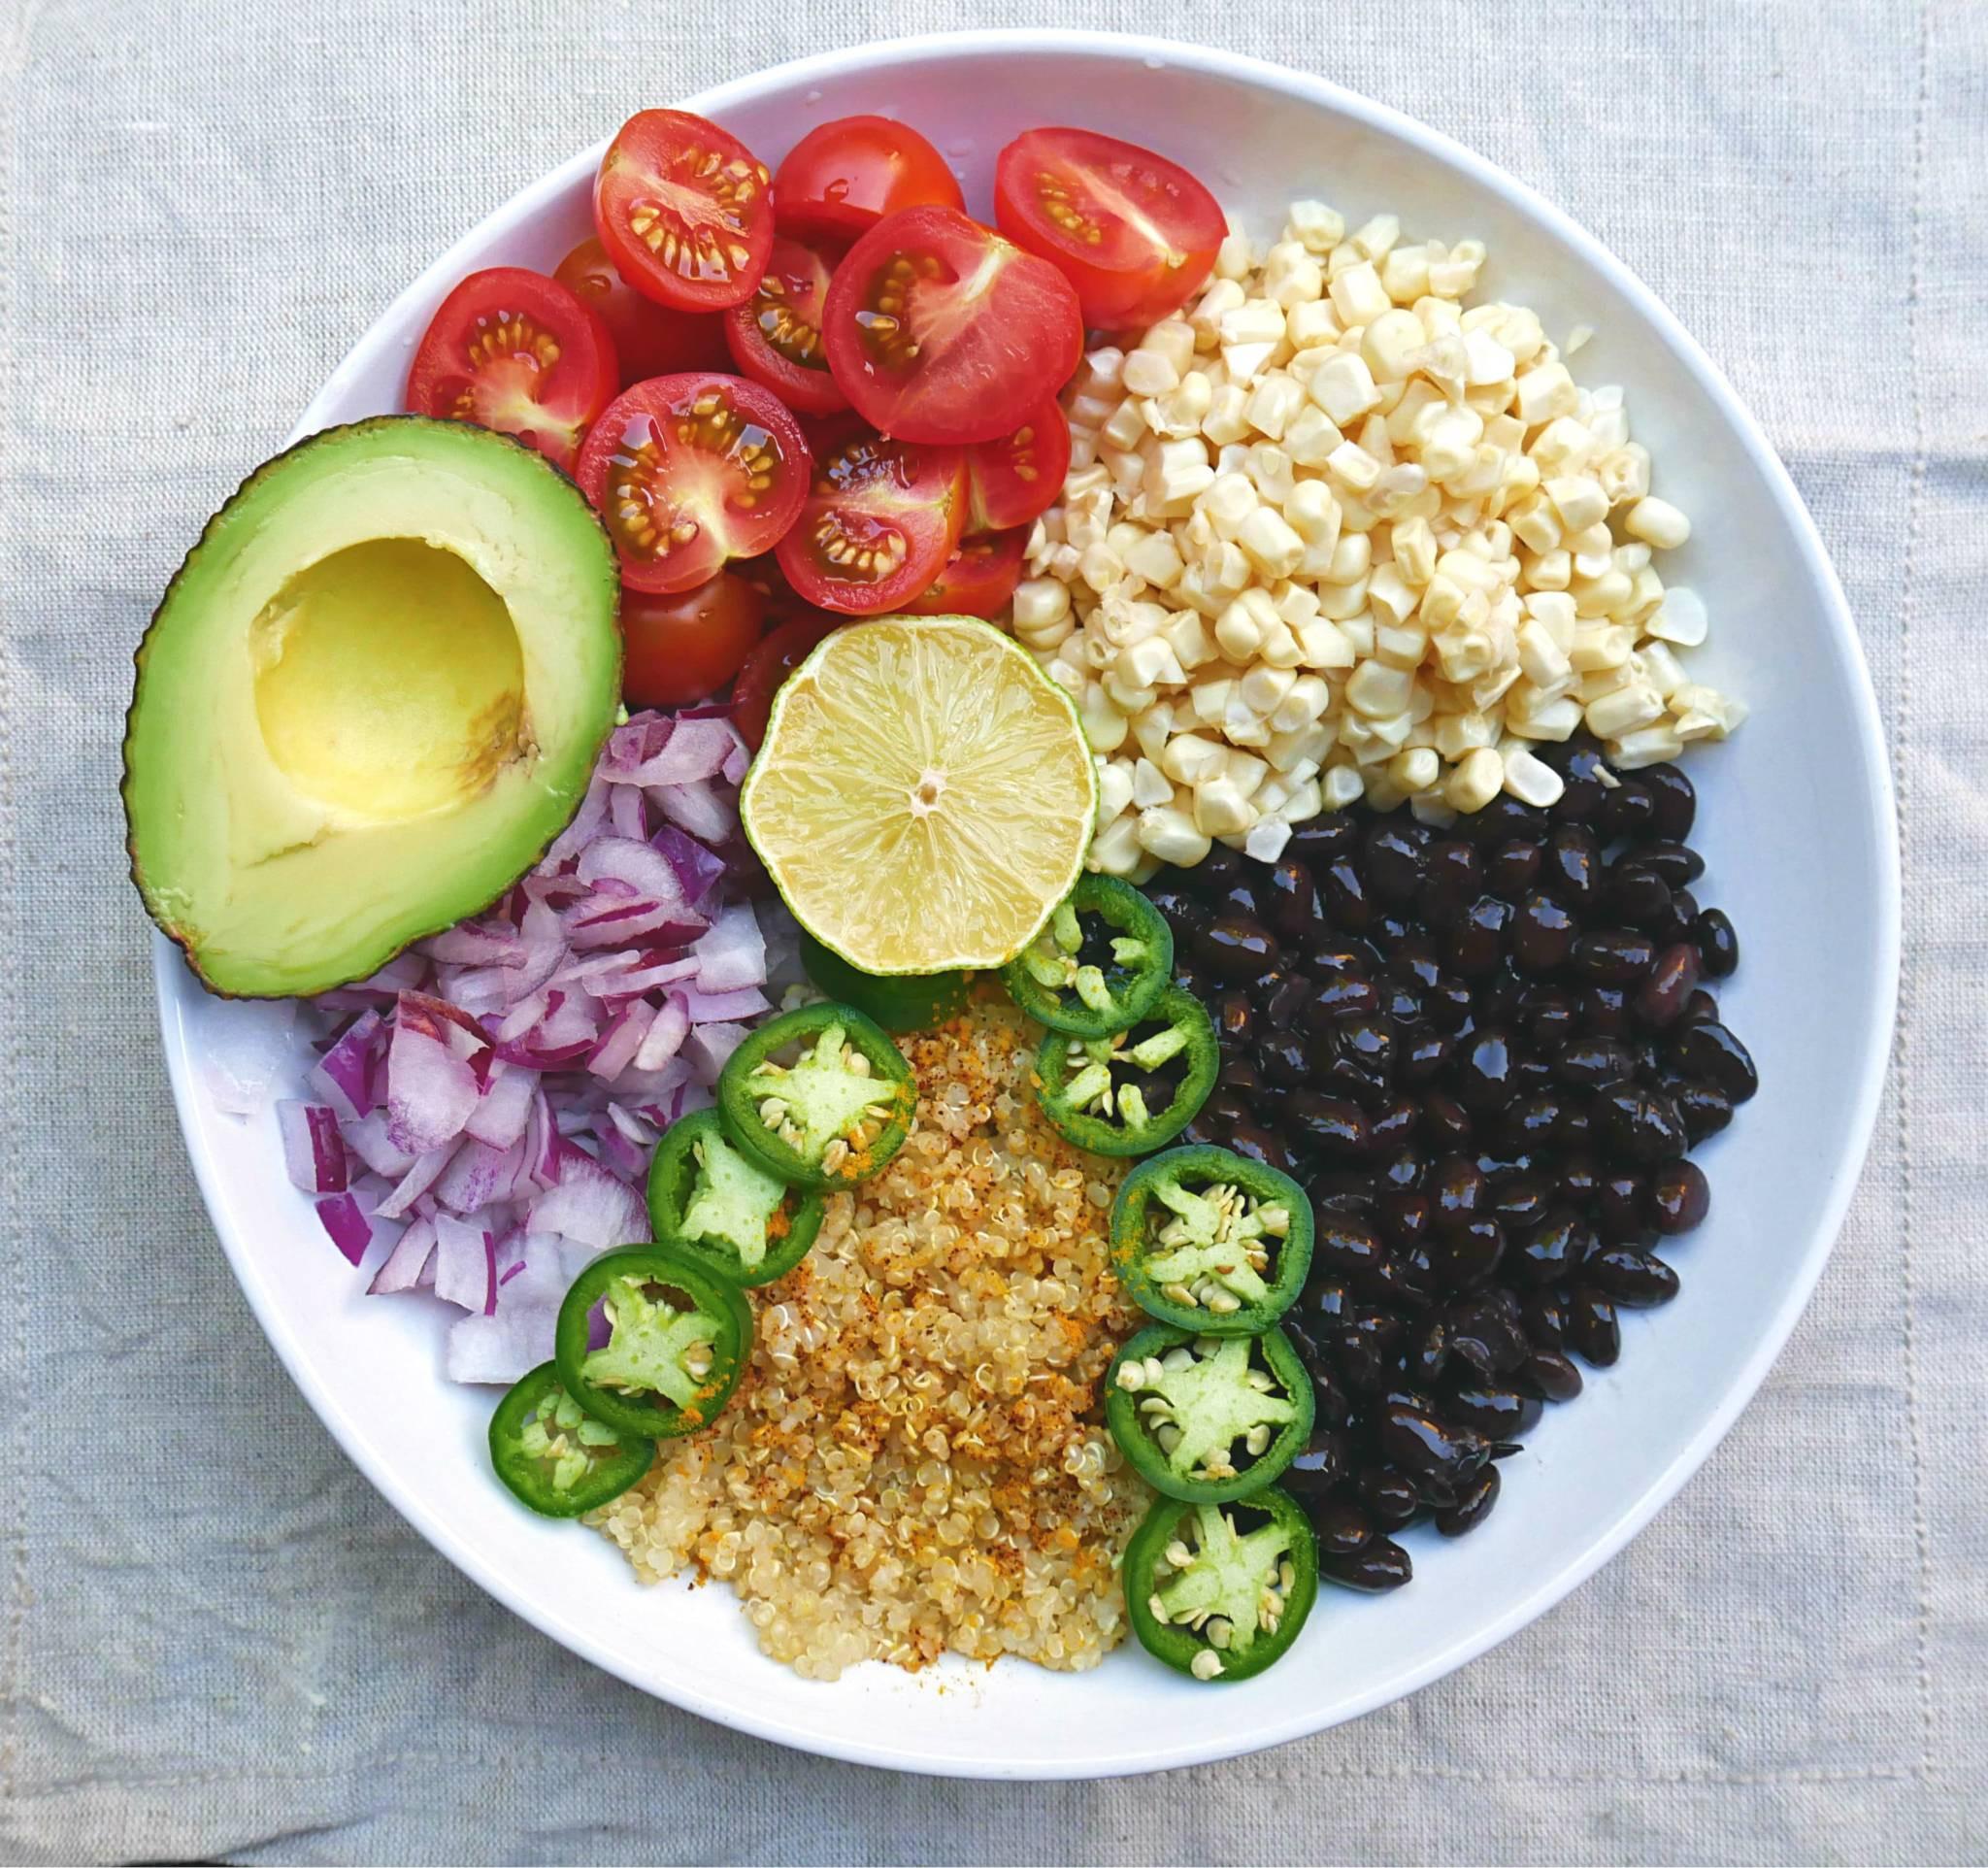 Vegan Bodybuilding Recipes  Vegan Essentials $50 Worth of My Favorite Vegan Pantry